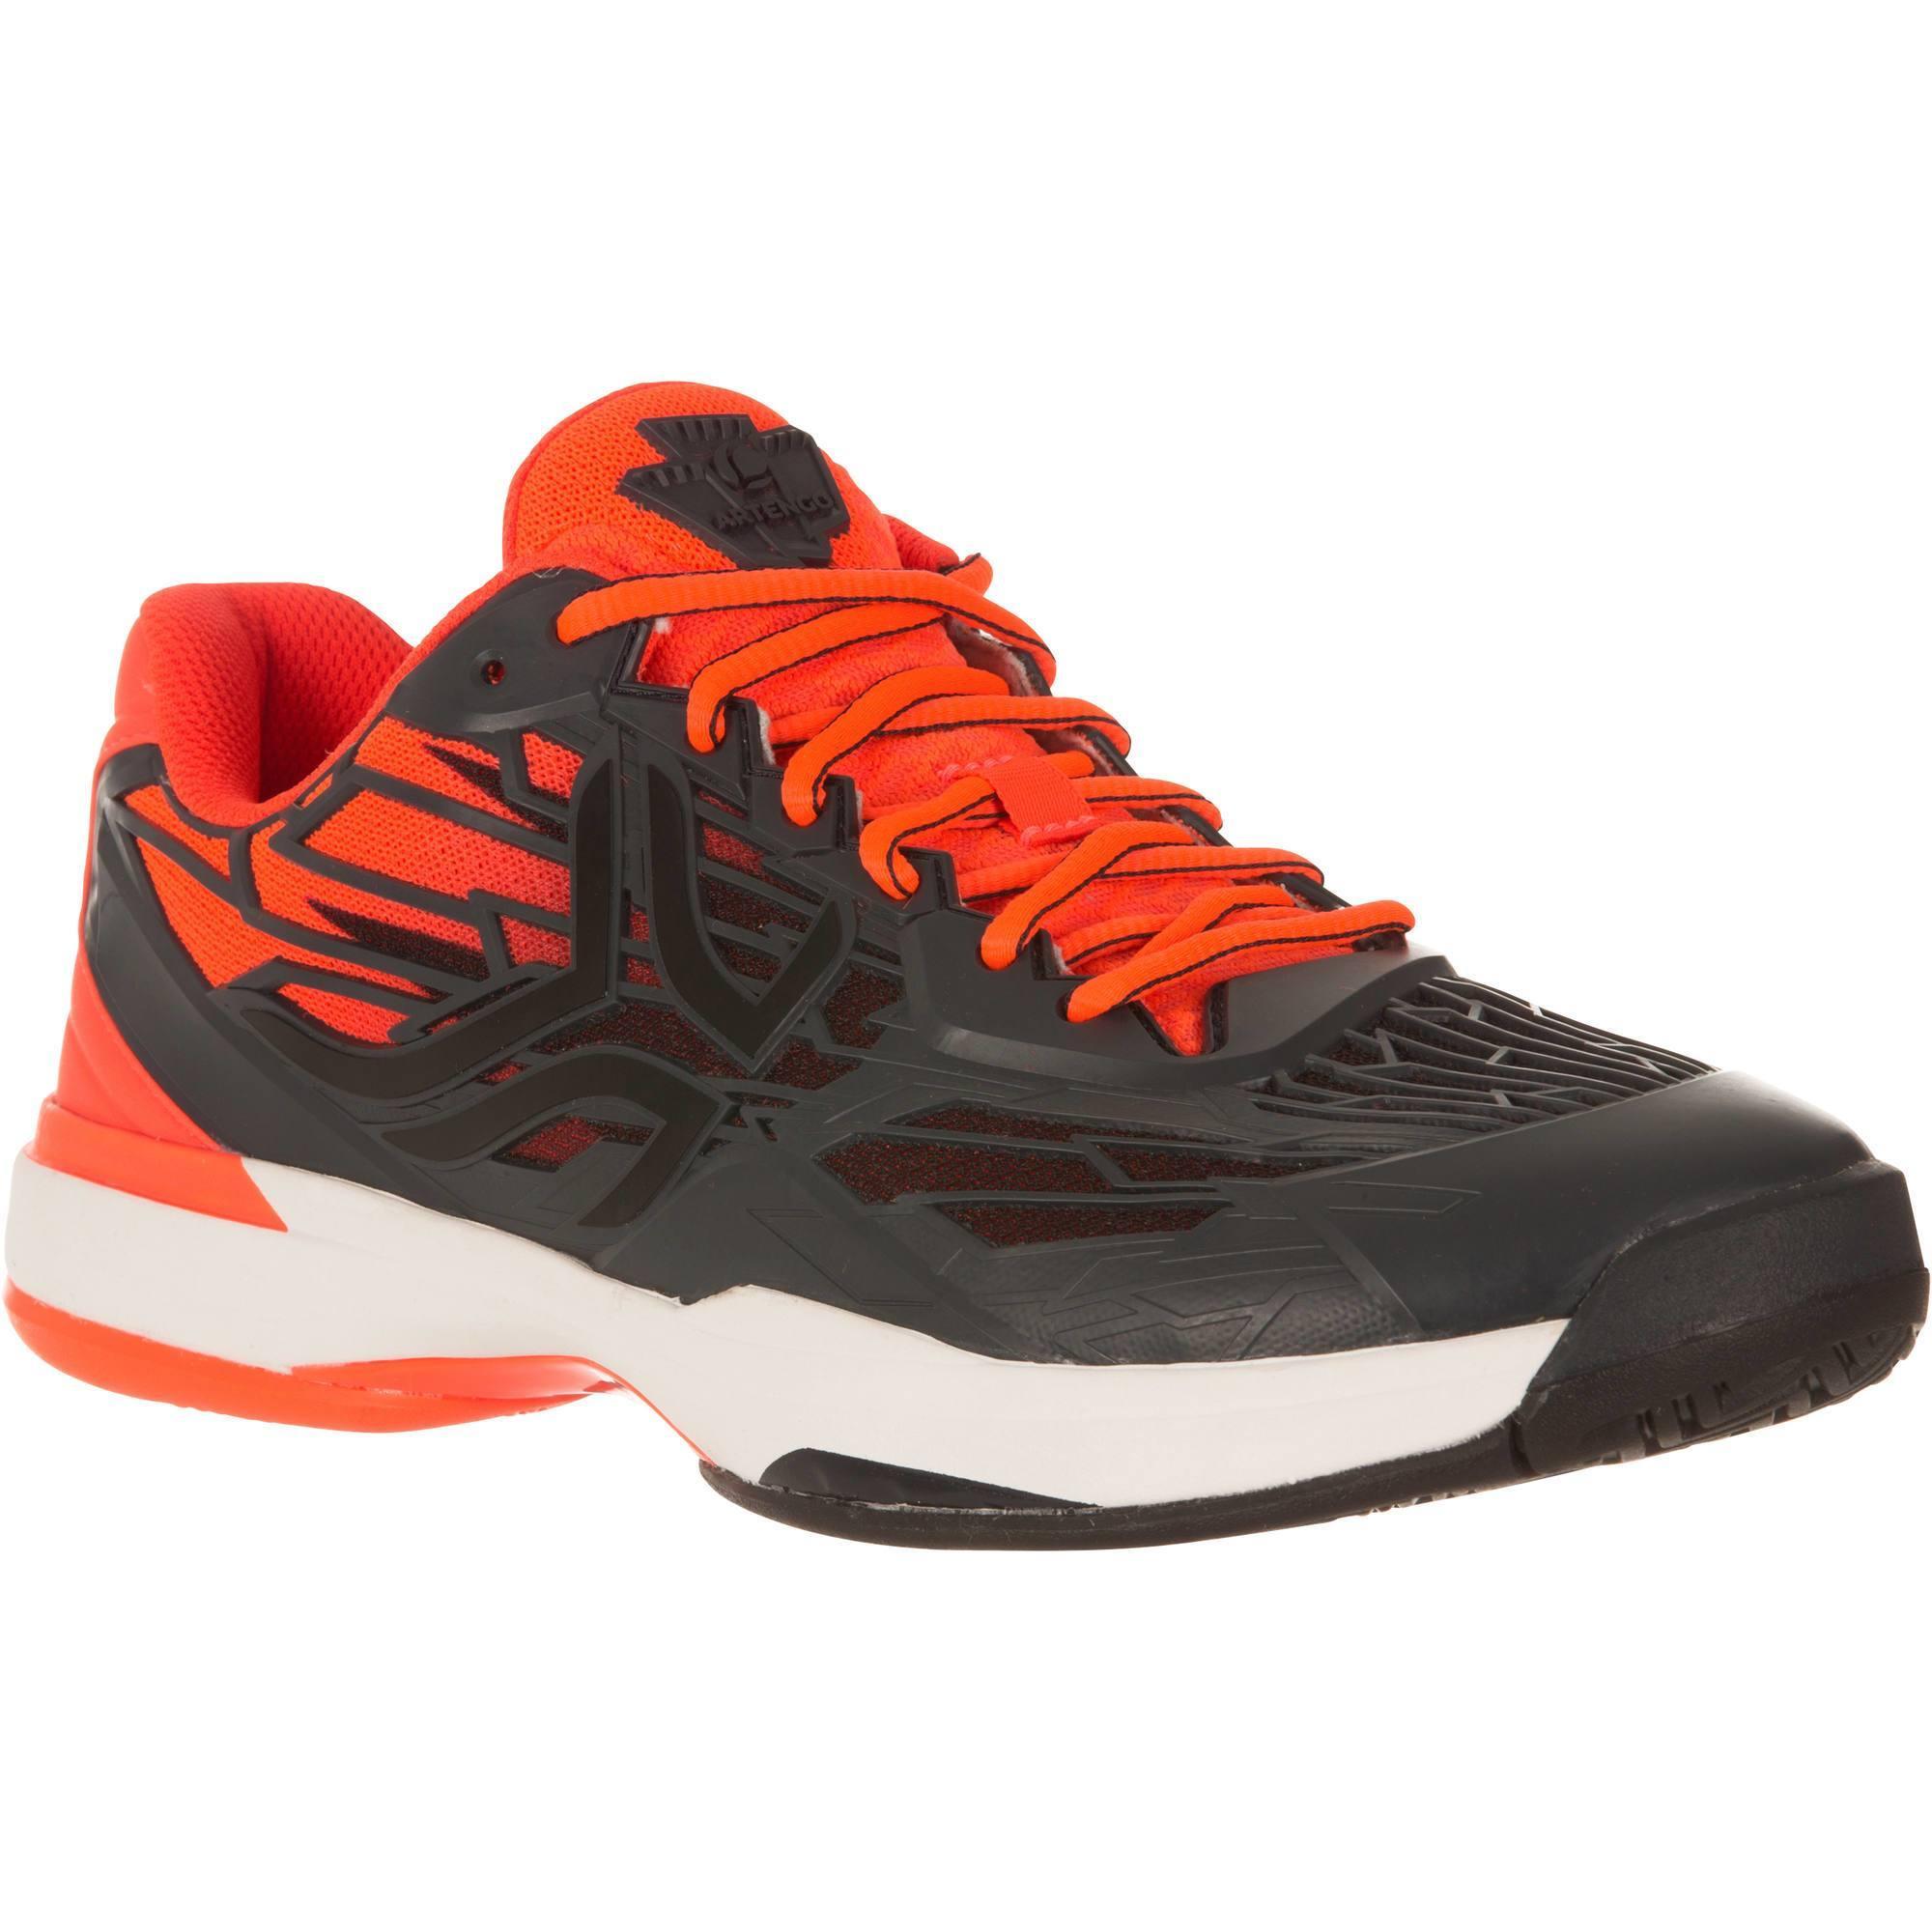 ts990 tennis shoes - black/orange | artengo UVQLXME